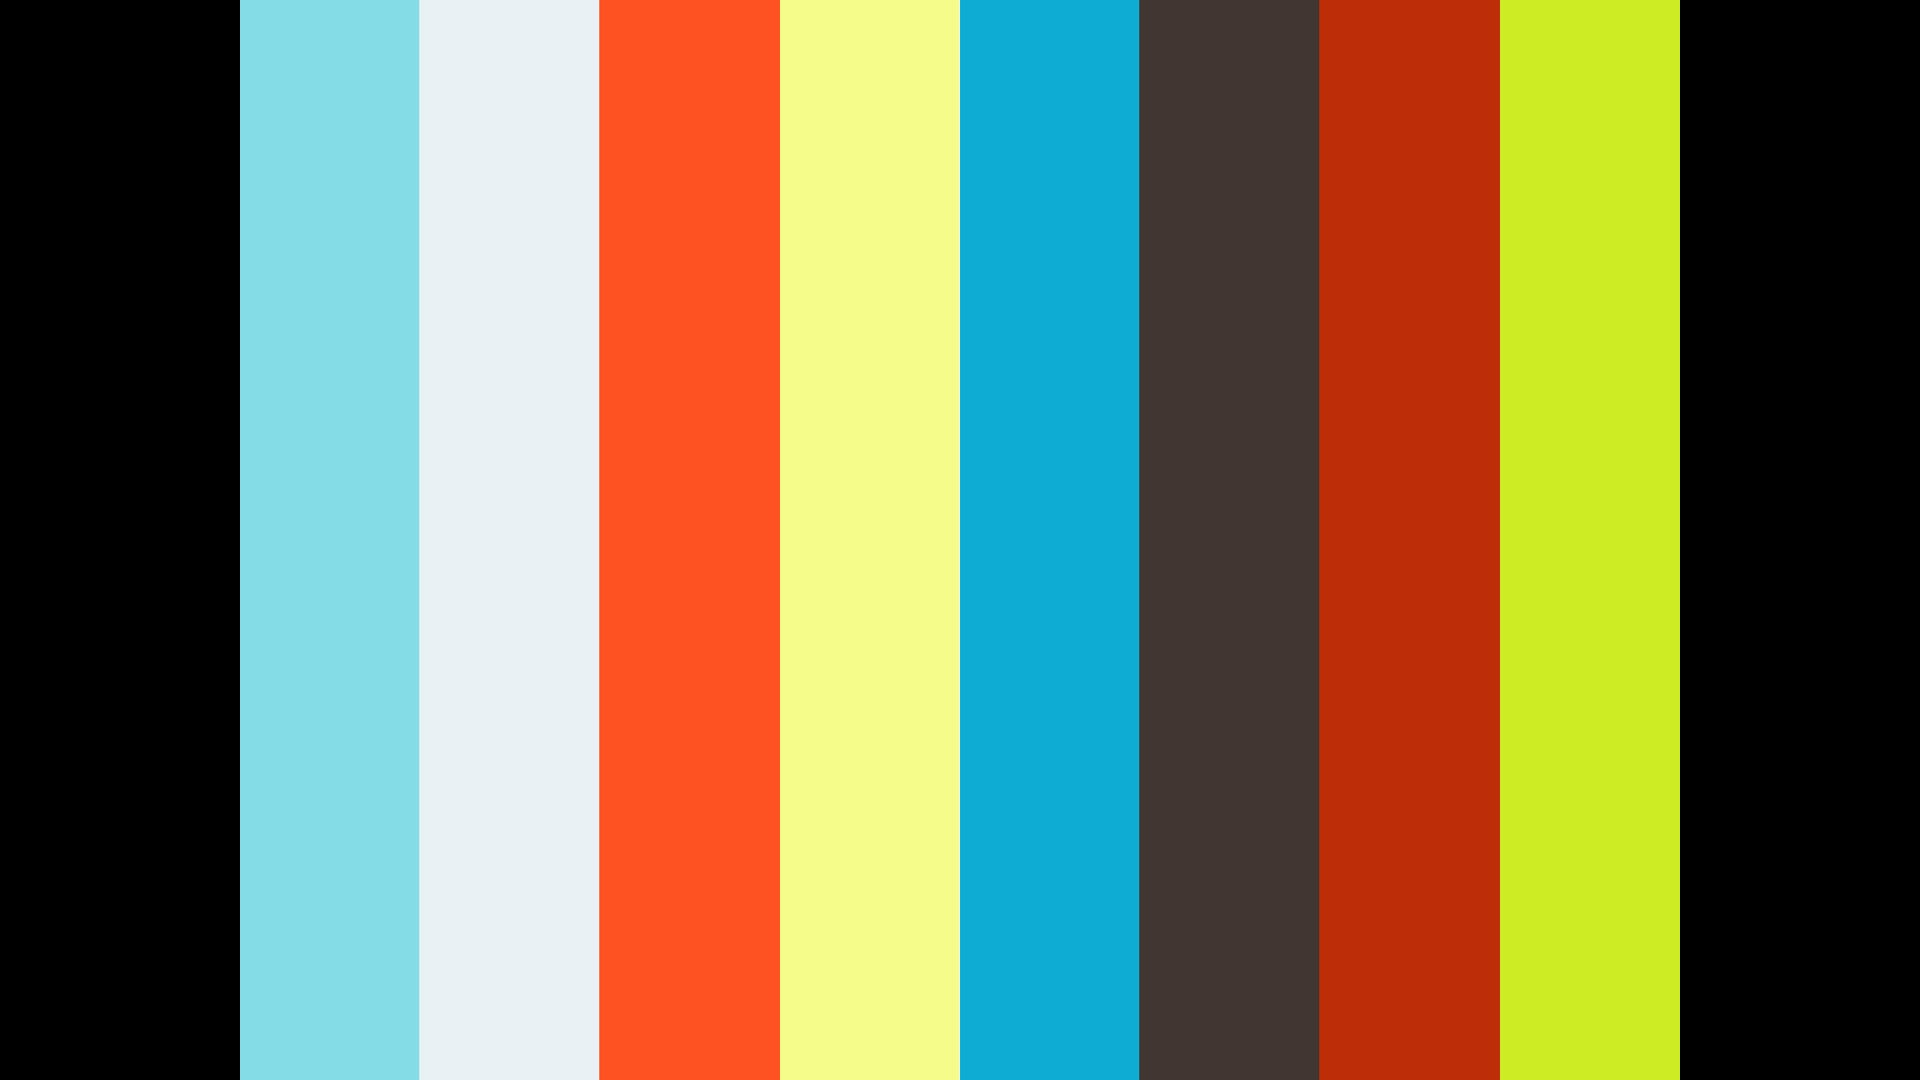 Burkard minirock katja Audible UK